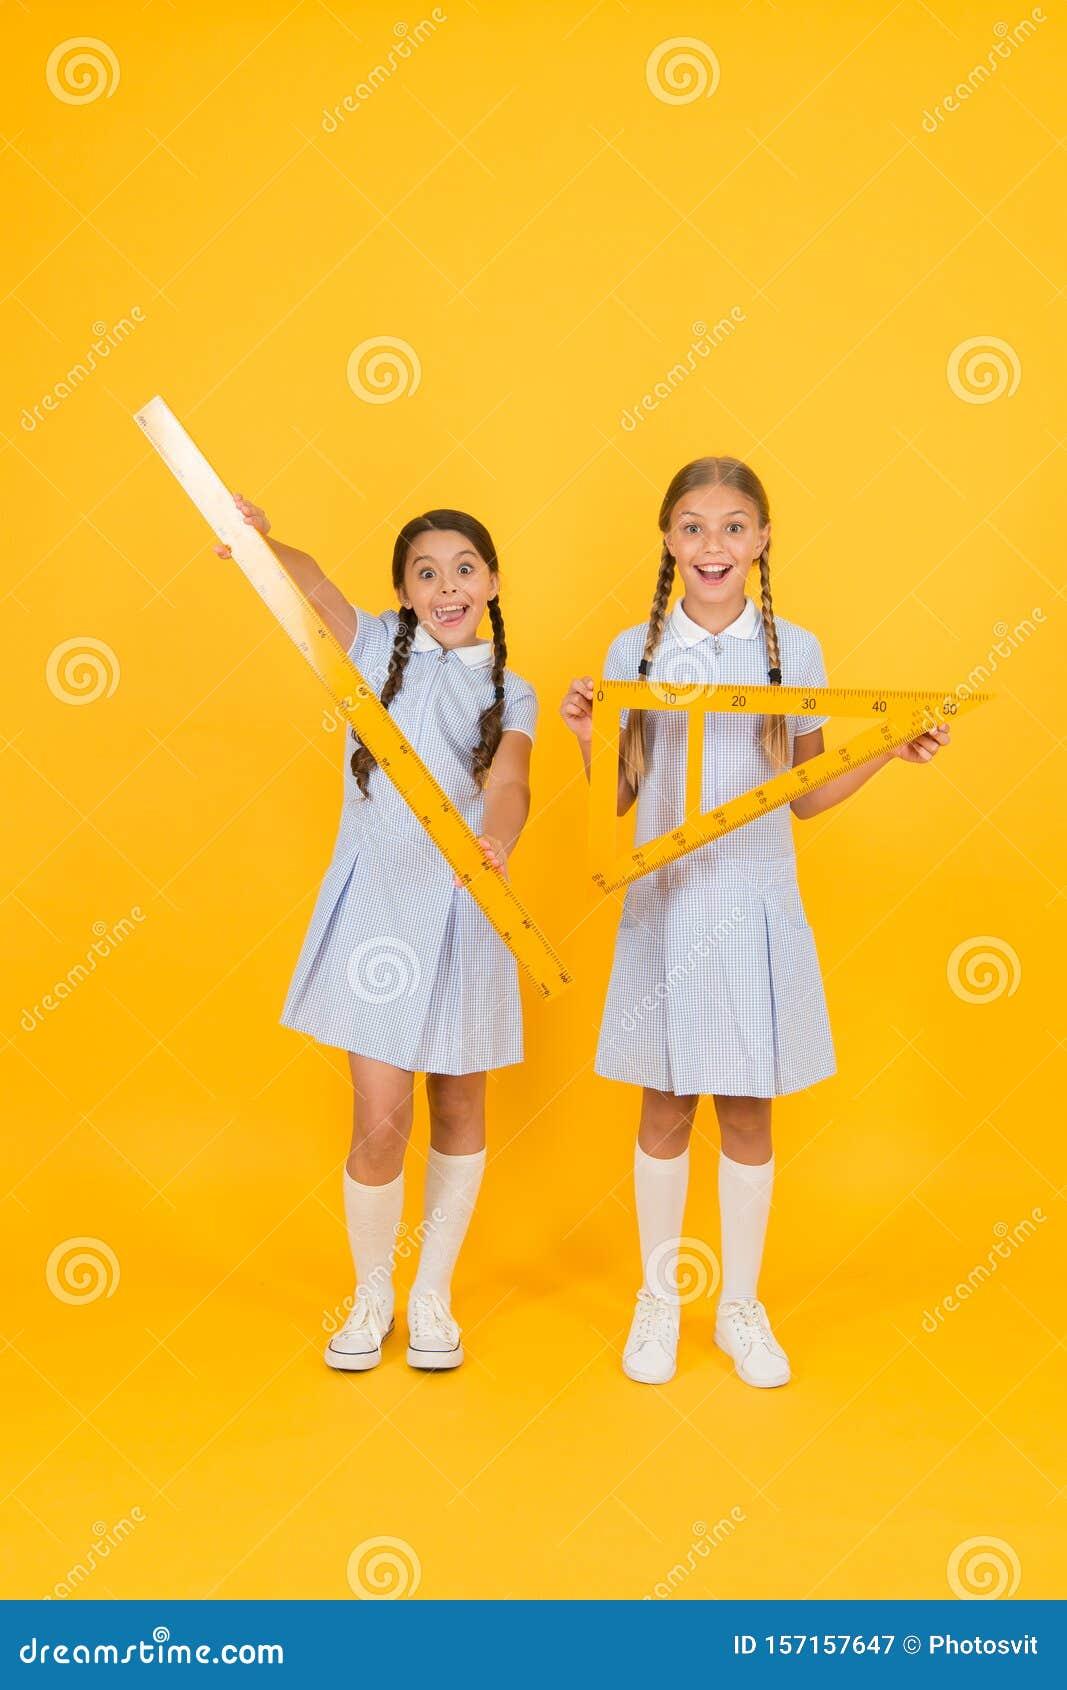 Geometric shapes. small girls love geometry. old school. modern education. happy friends in retro uniform. vintage kid